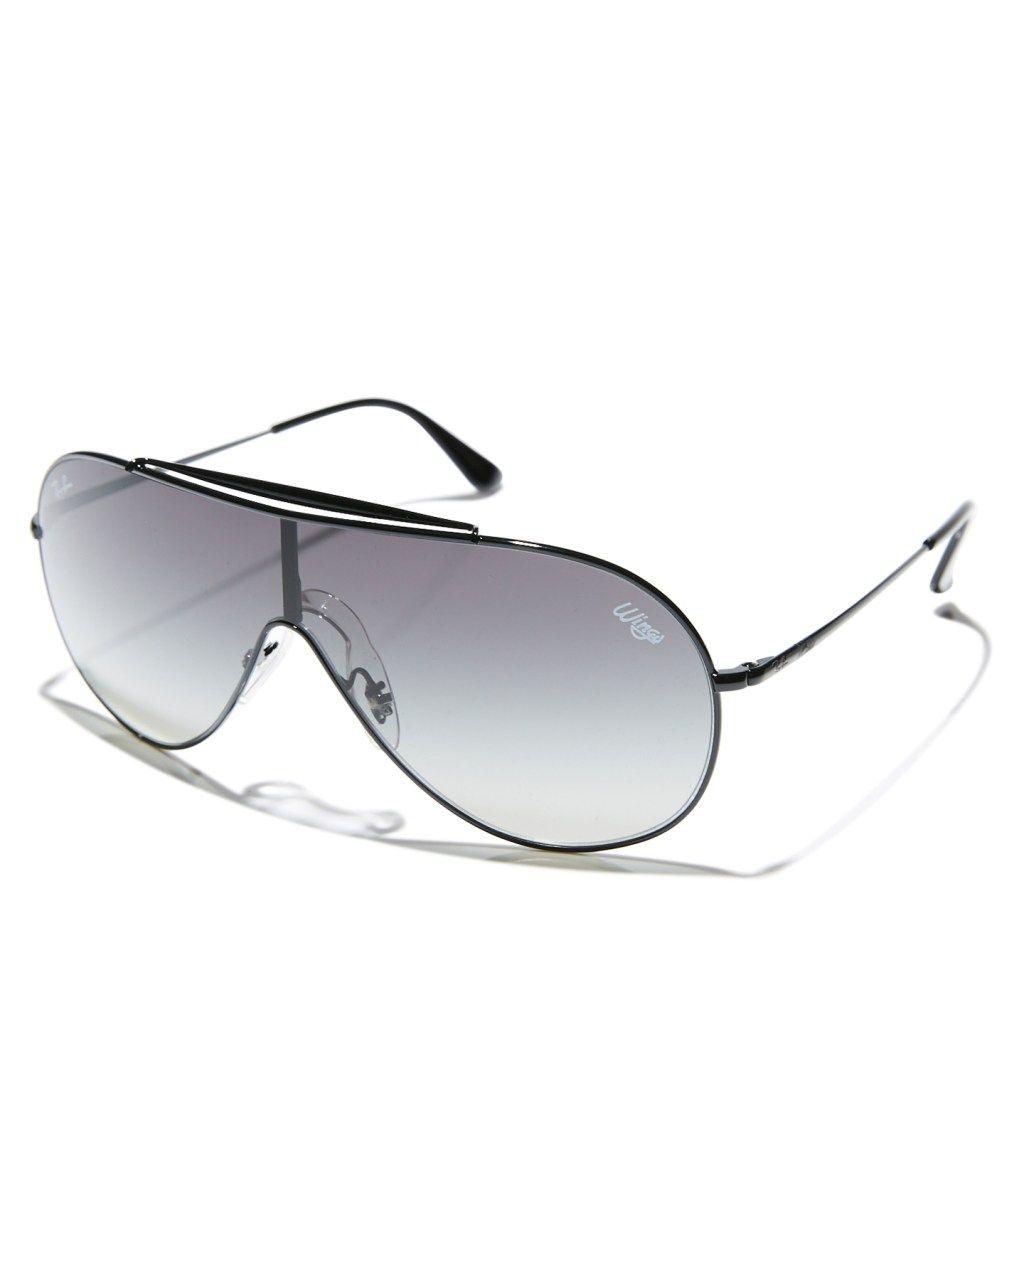 ca6ea9bf45 Ray-Ban Wings Sunglasses Black Grey Gradient Mens sunglasses Size ...